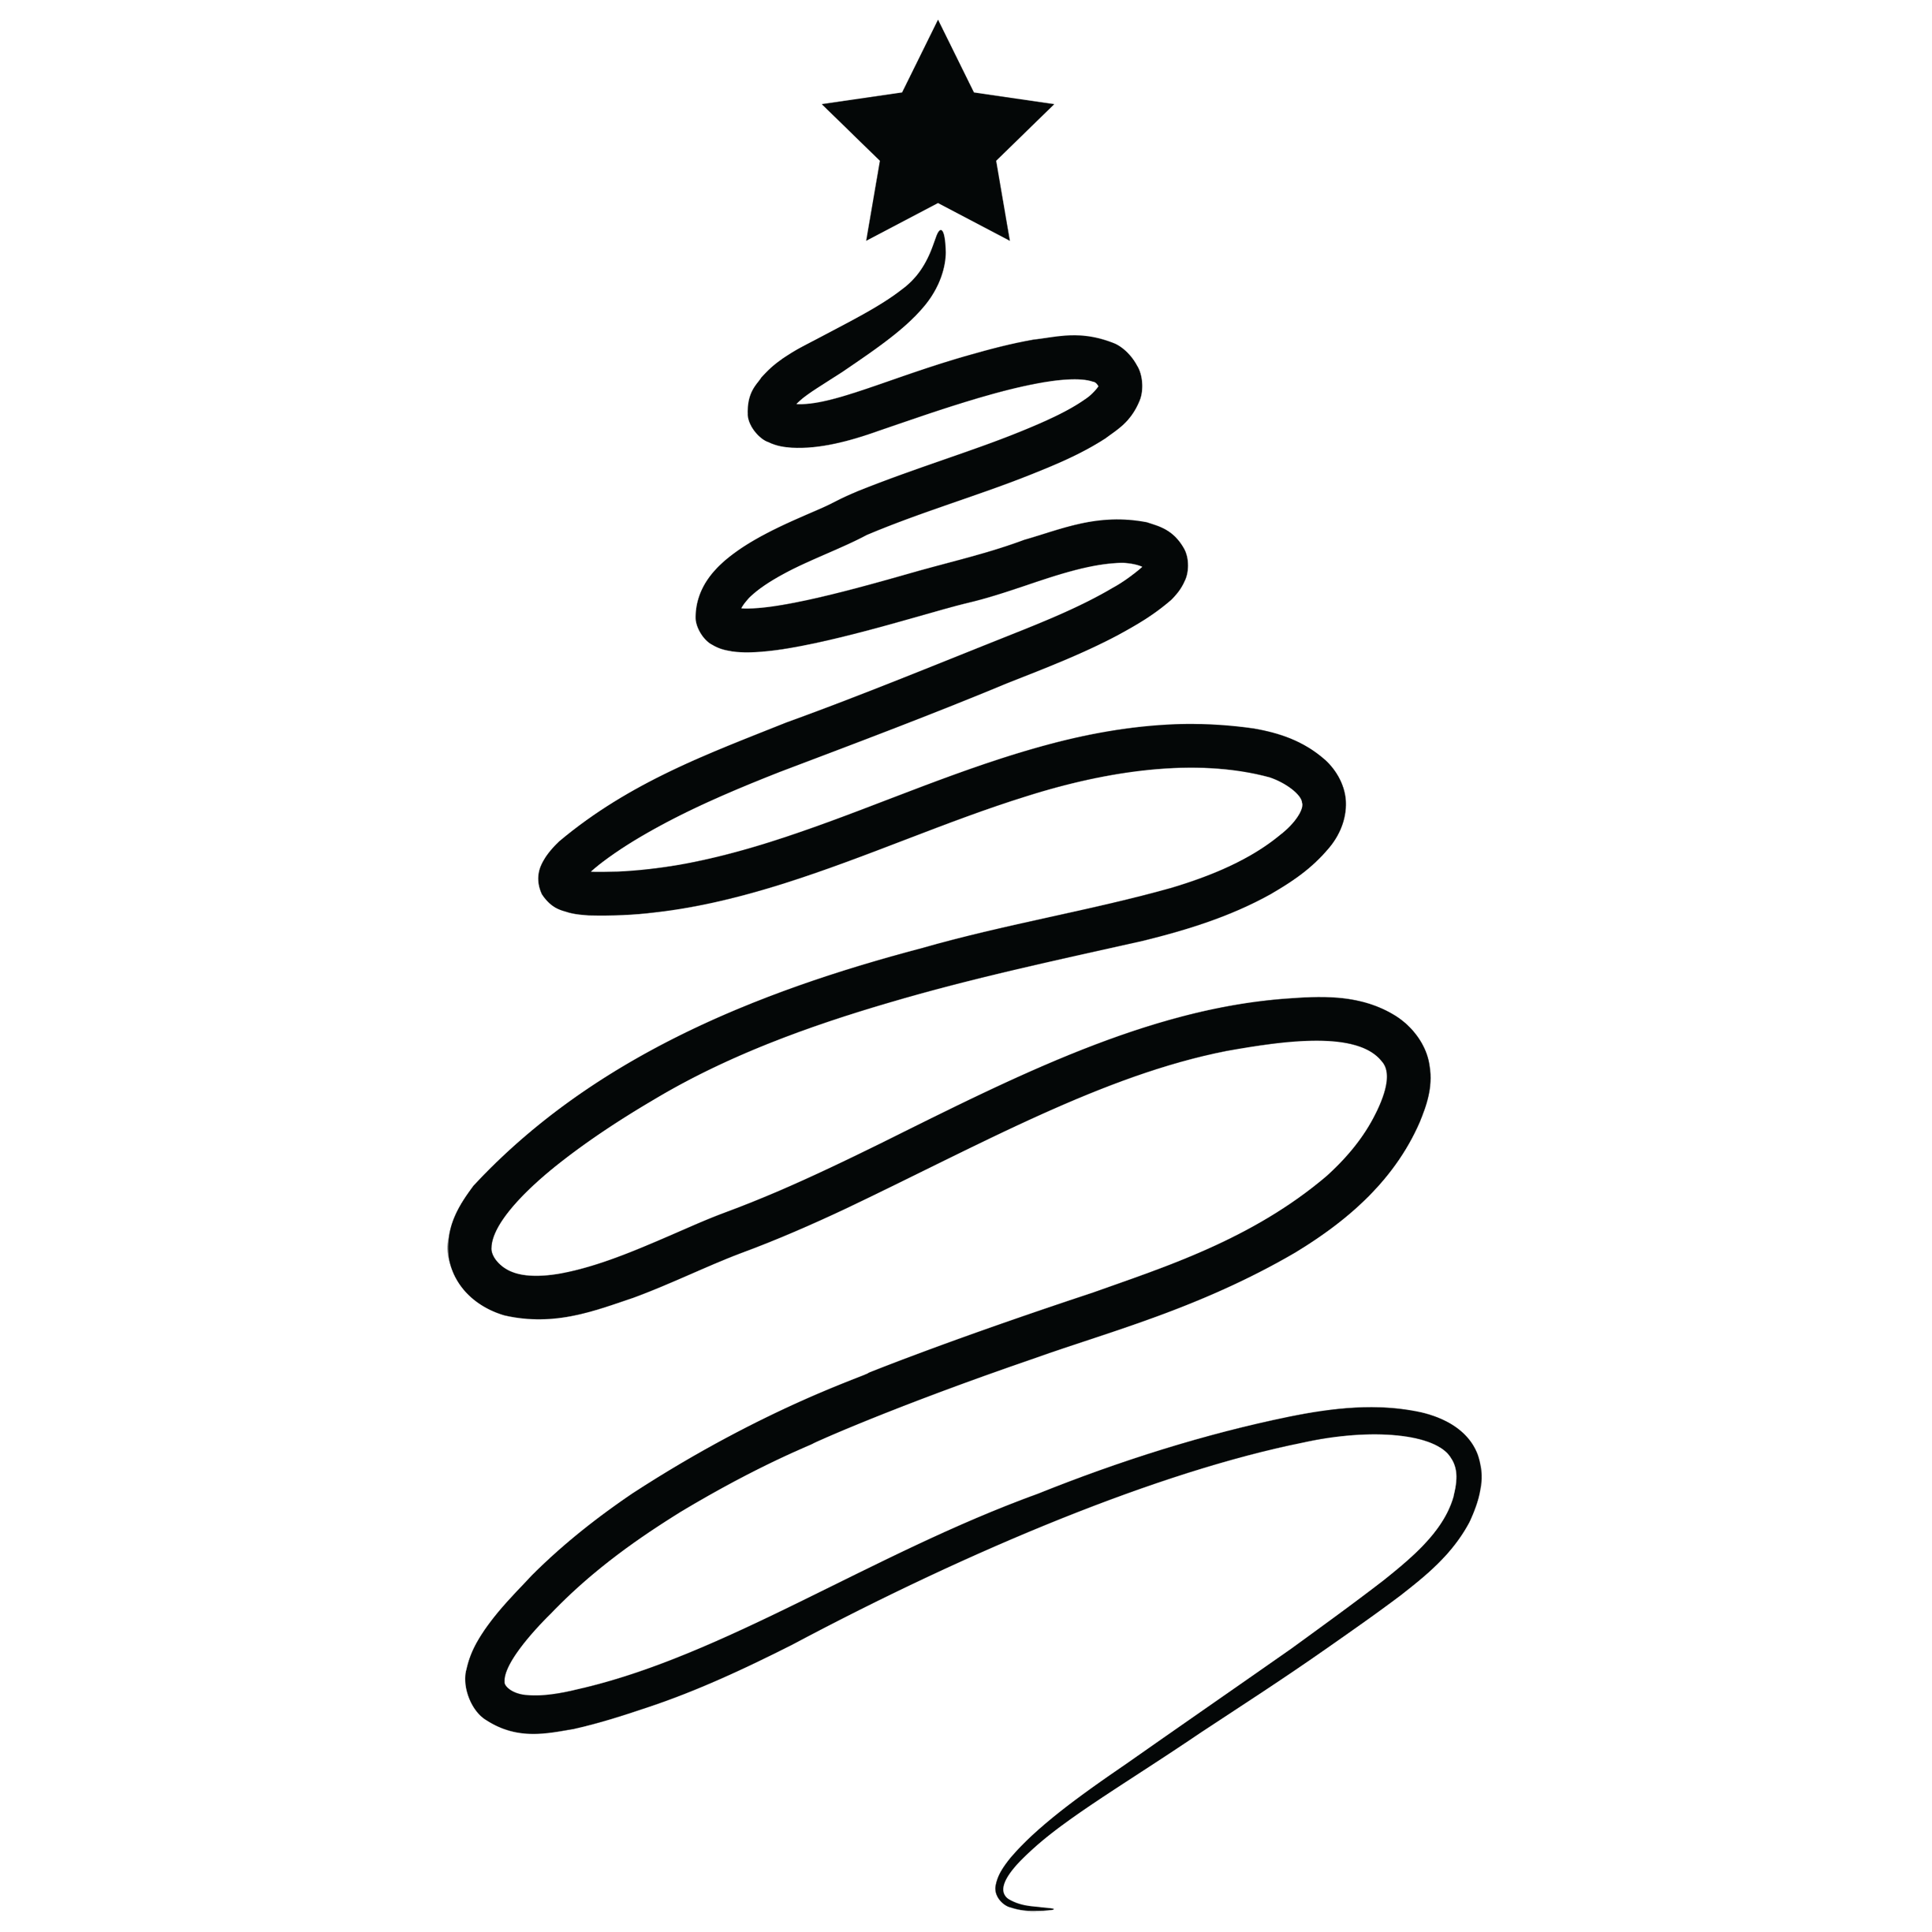 2450x2450 Christmas Tree Silhouette Free Download Clip Art Free Clip Art